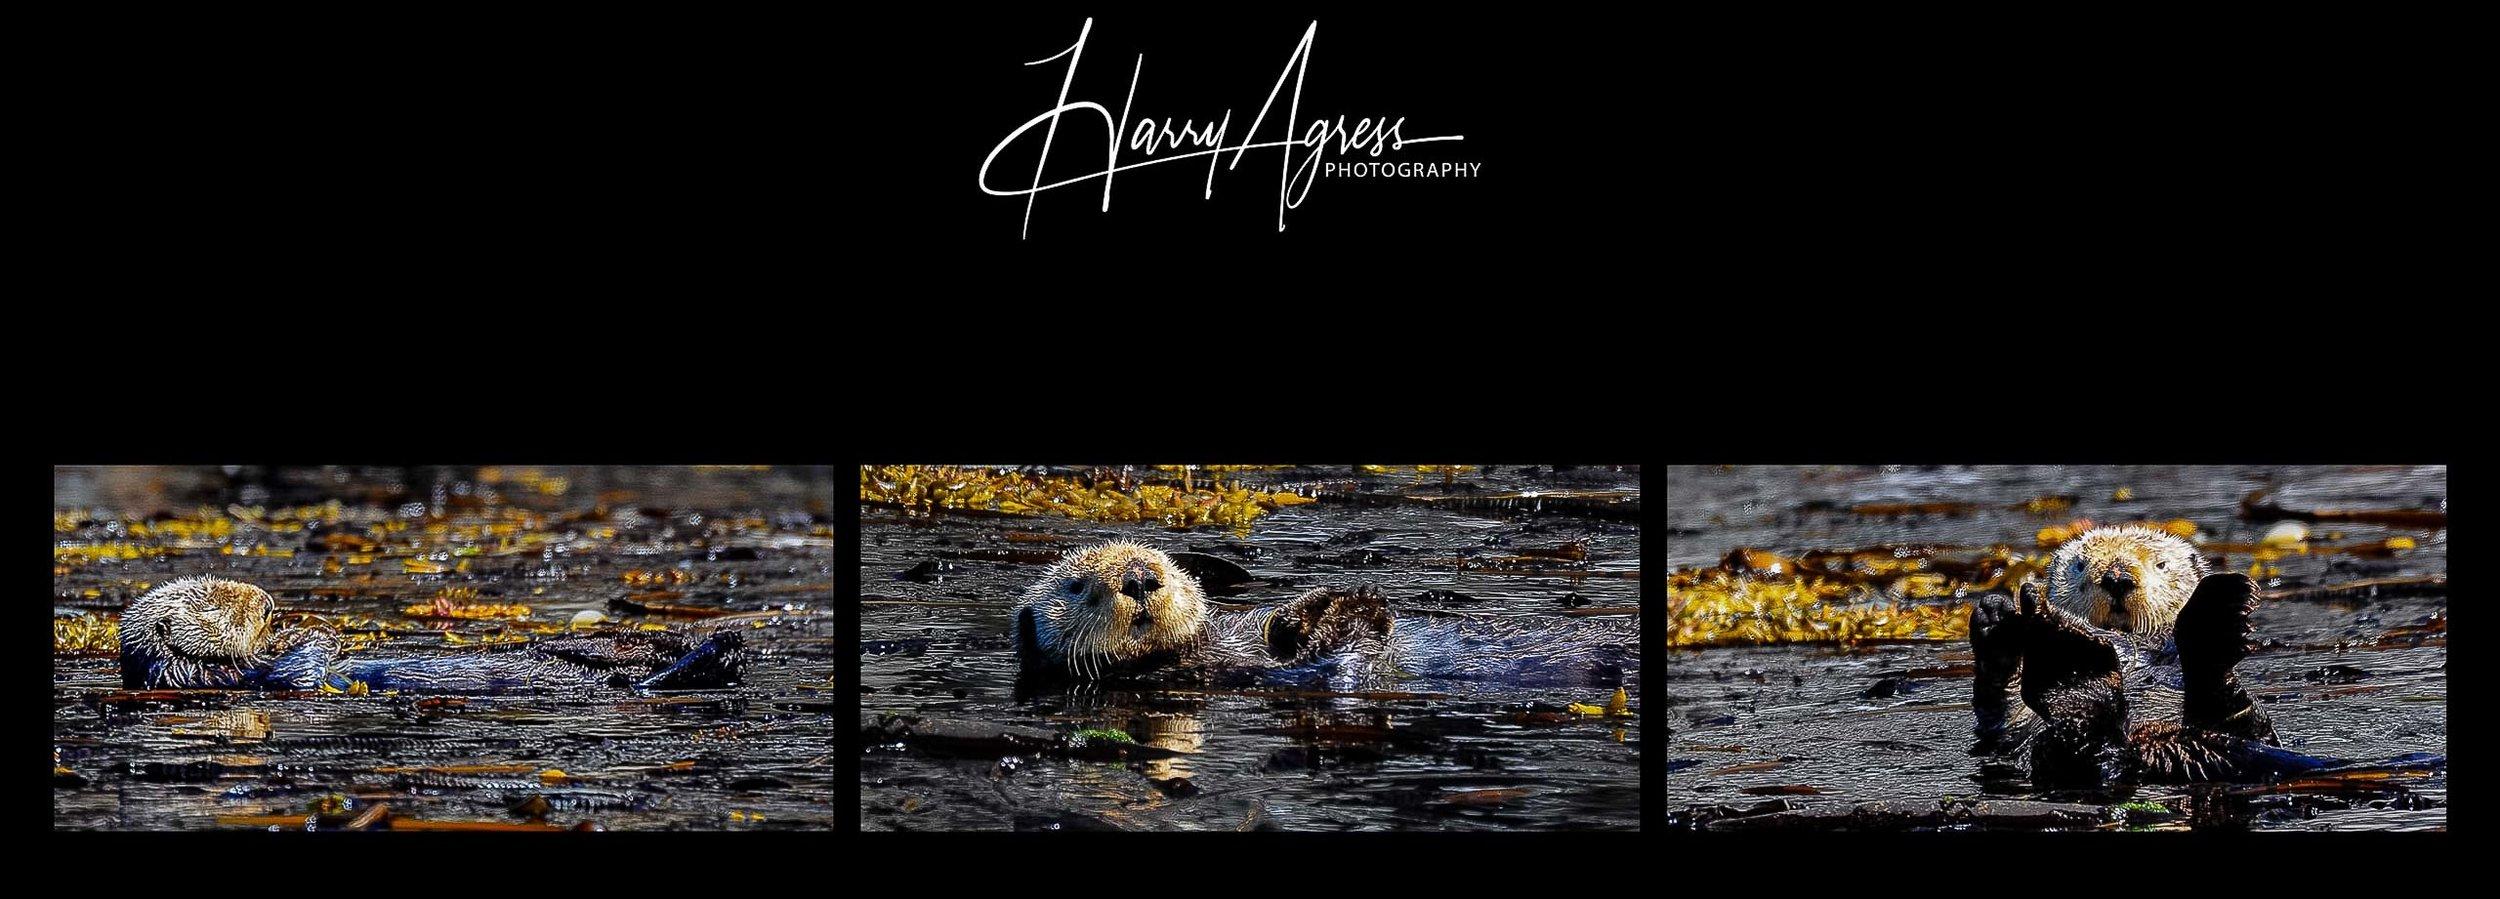 Otter Nap. Inside Passage, Alaska 2011